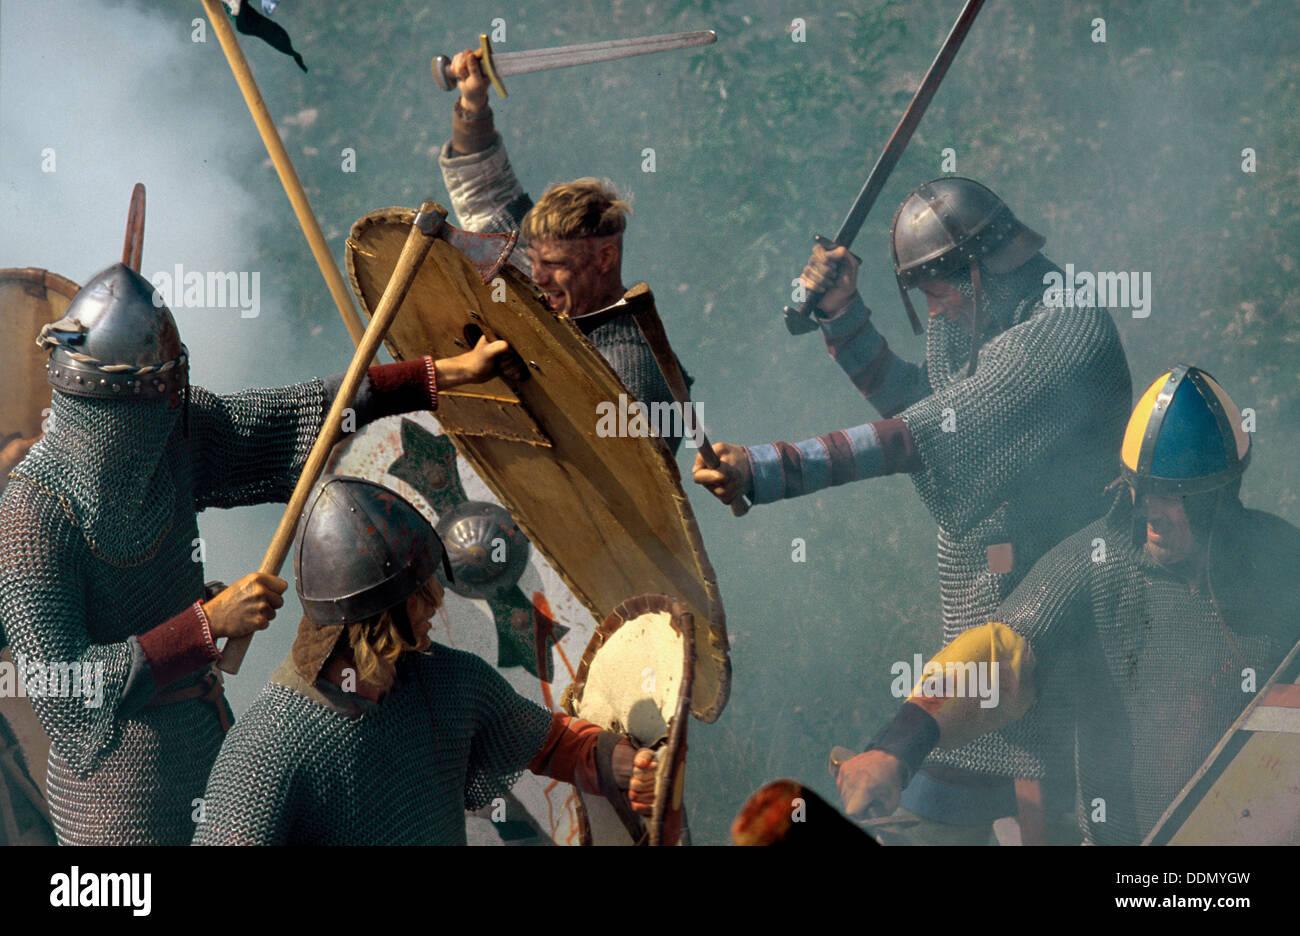 Battle re-enactment. Artist: Geoffrey Davis - Stock Image